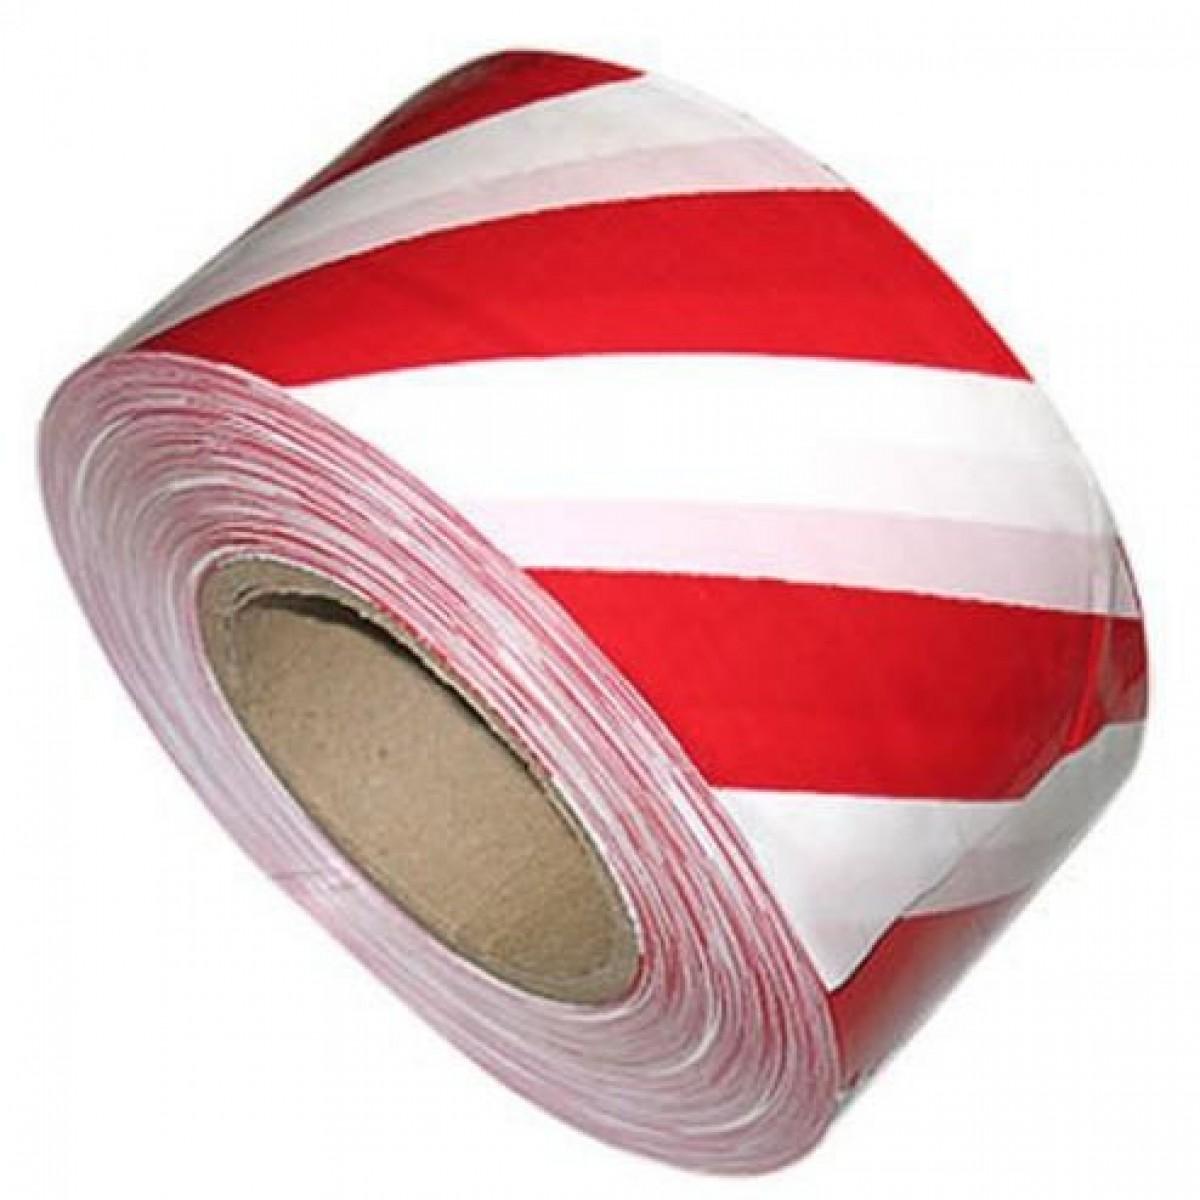 Лента сигнальная красно-белая, ширина 50 мм (150 м) фото